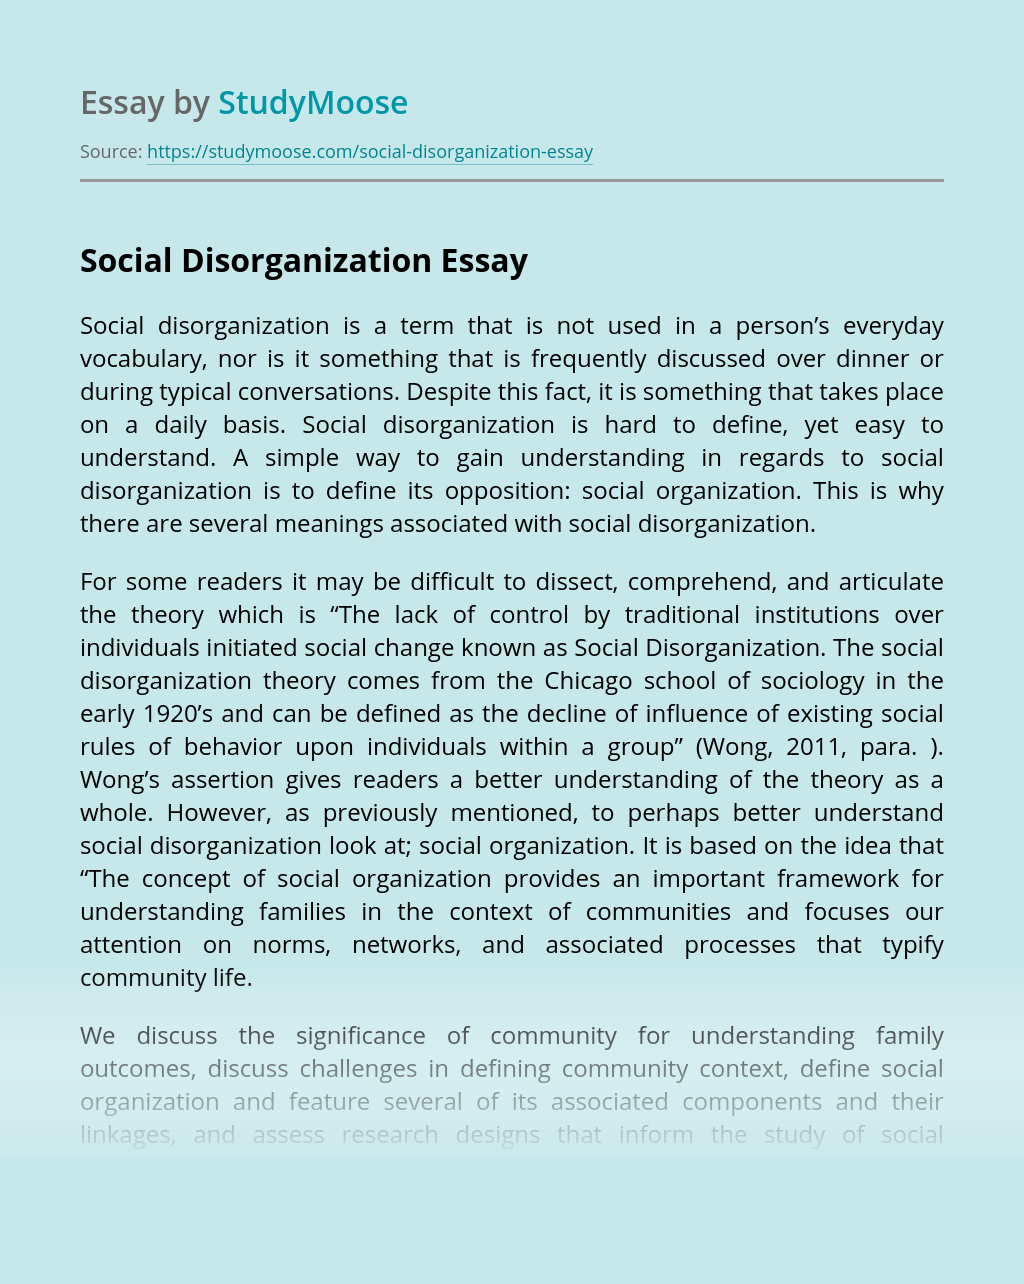 Understanding About Social Disorganization